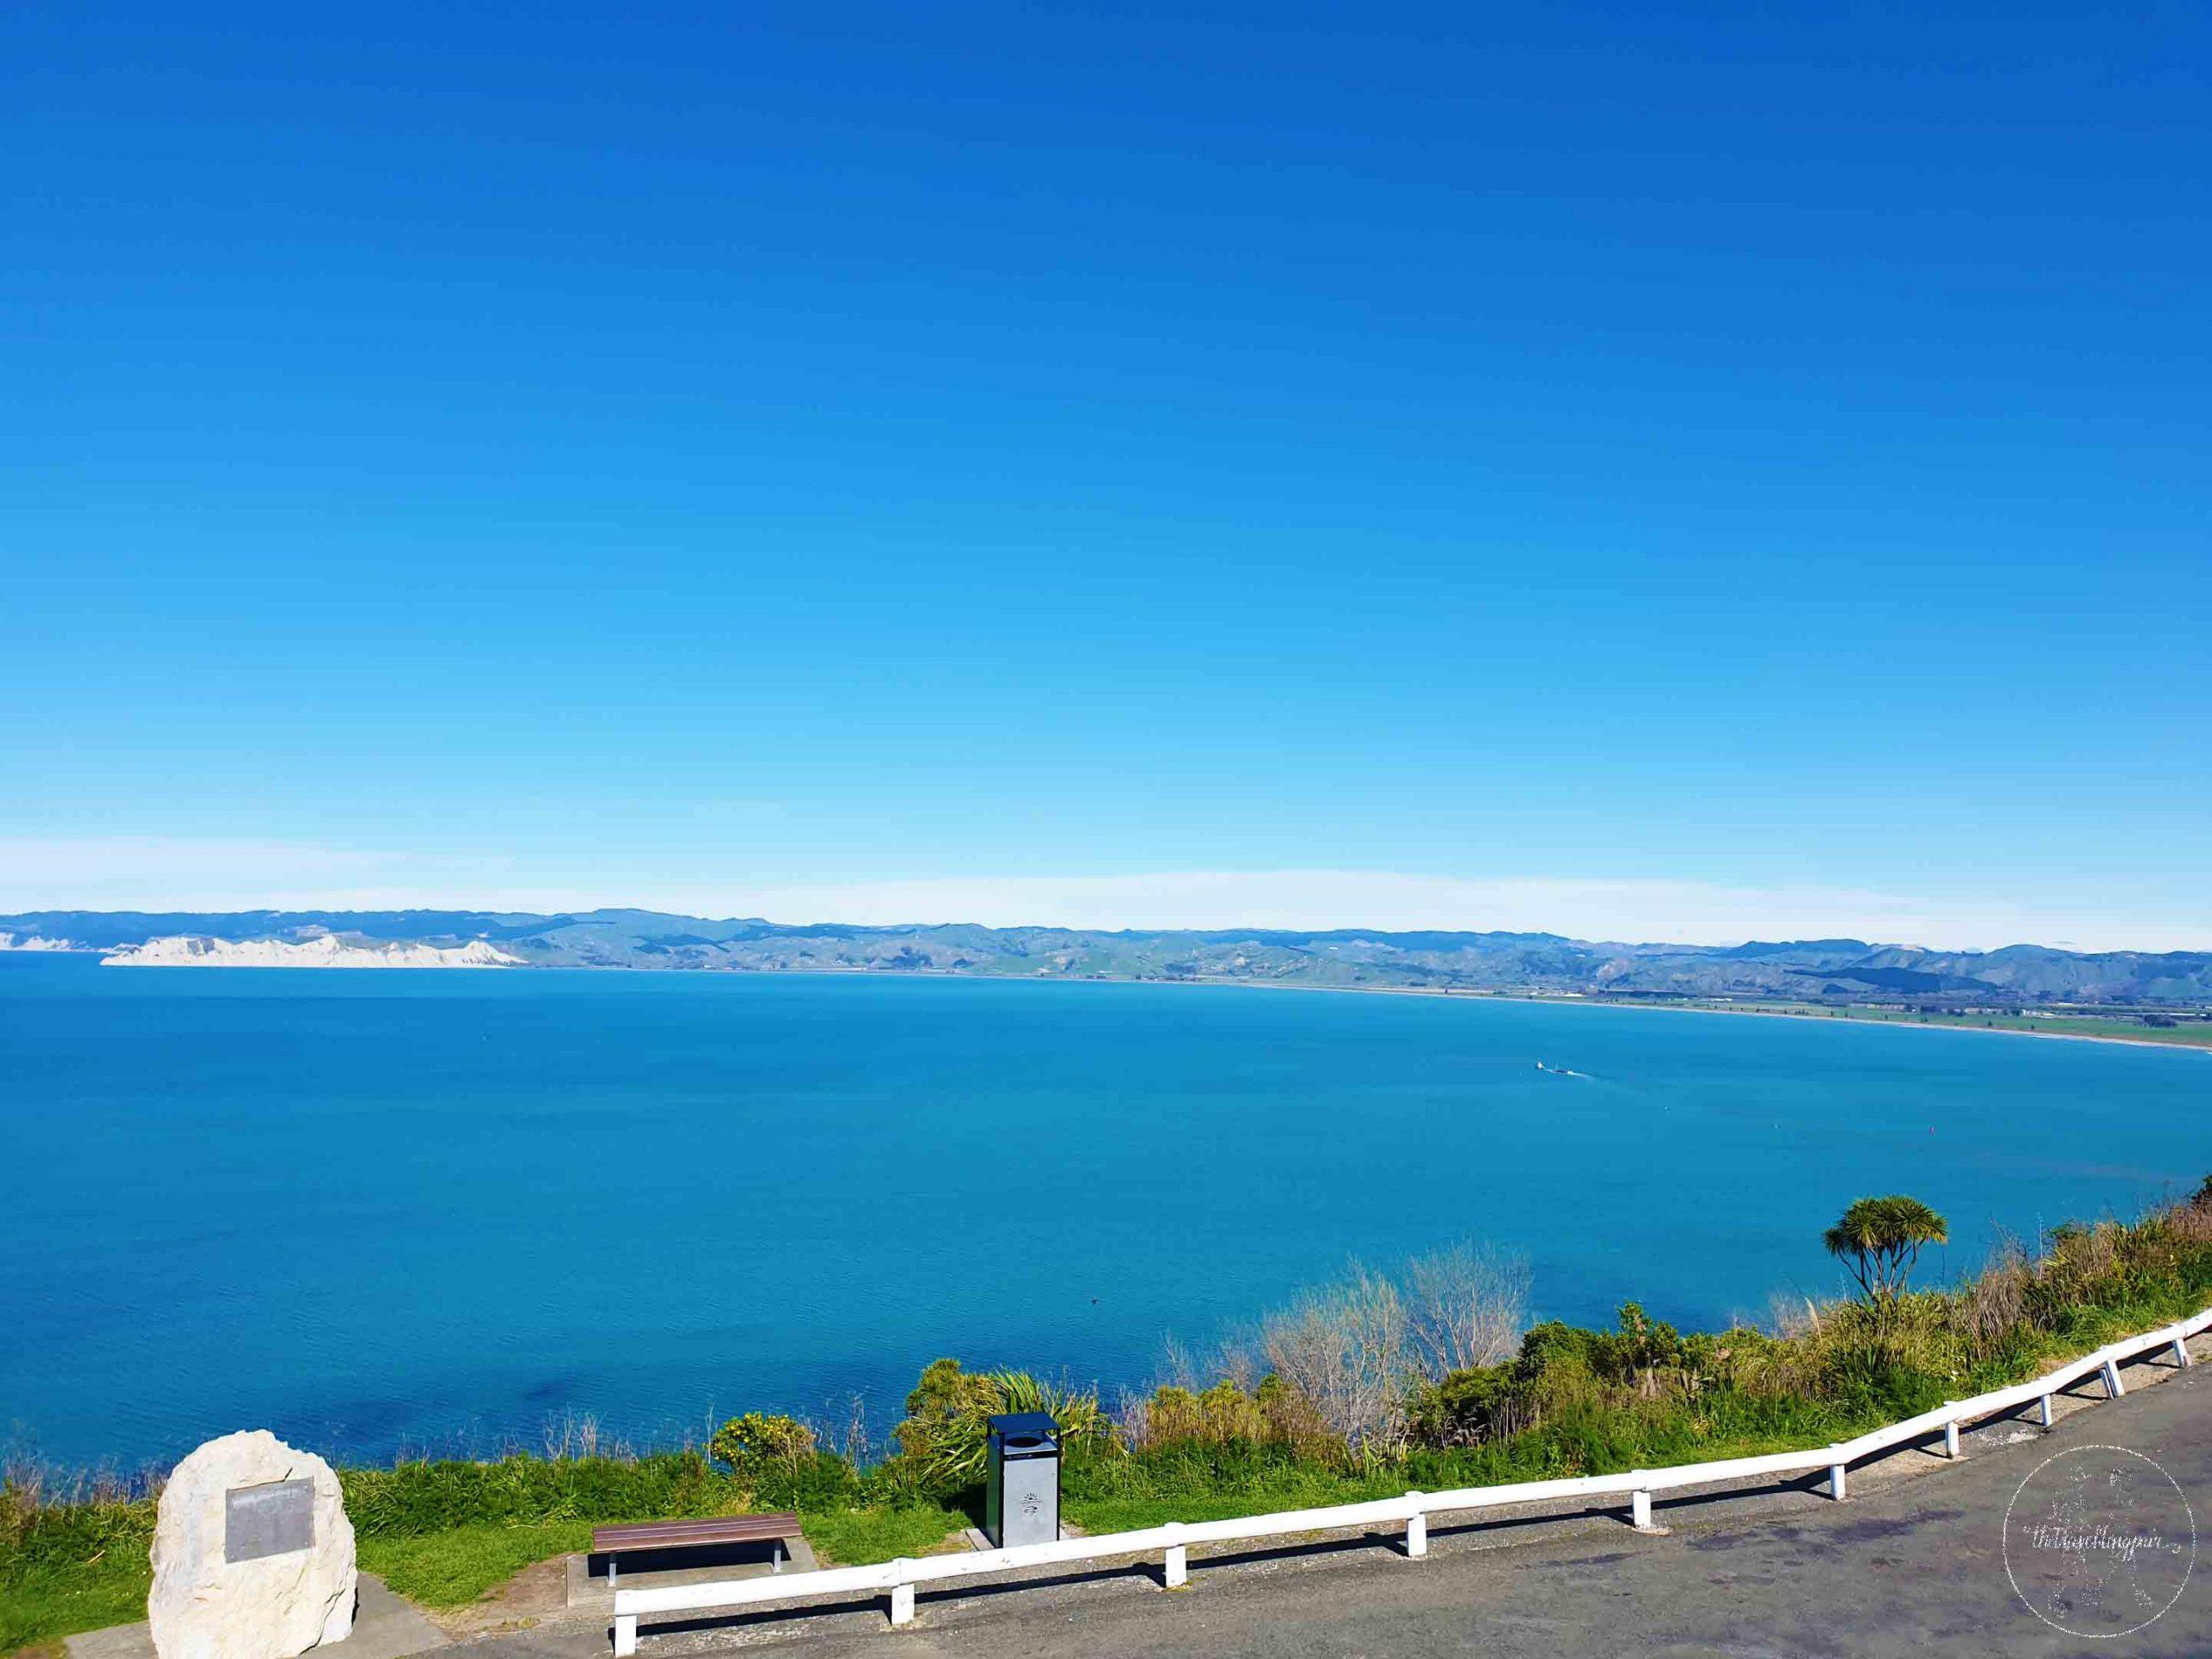 Kaiti Hill Gisborne - Join the Travelling Pair